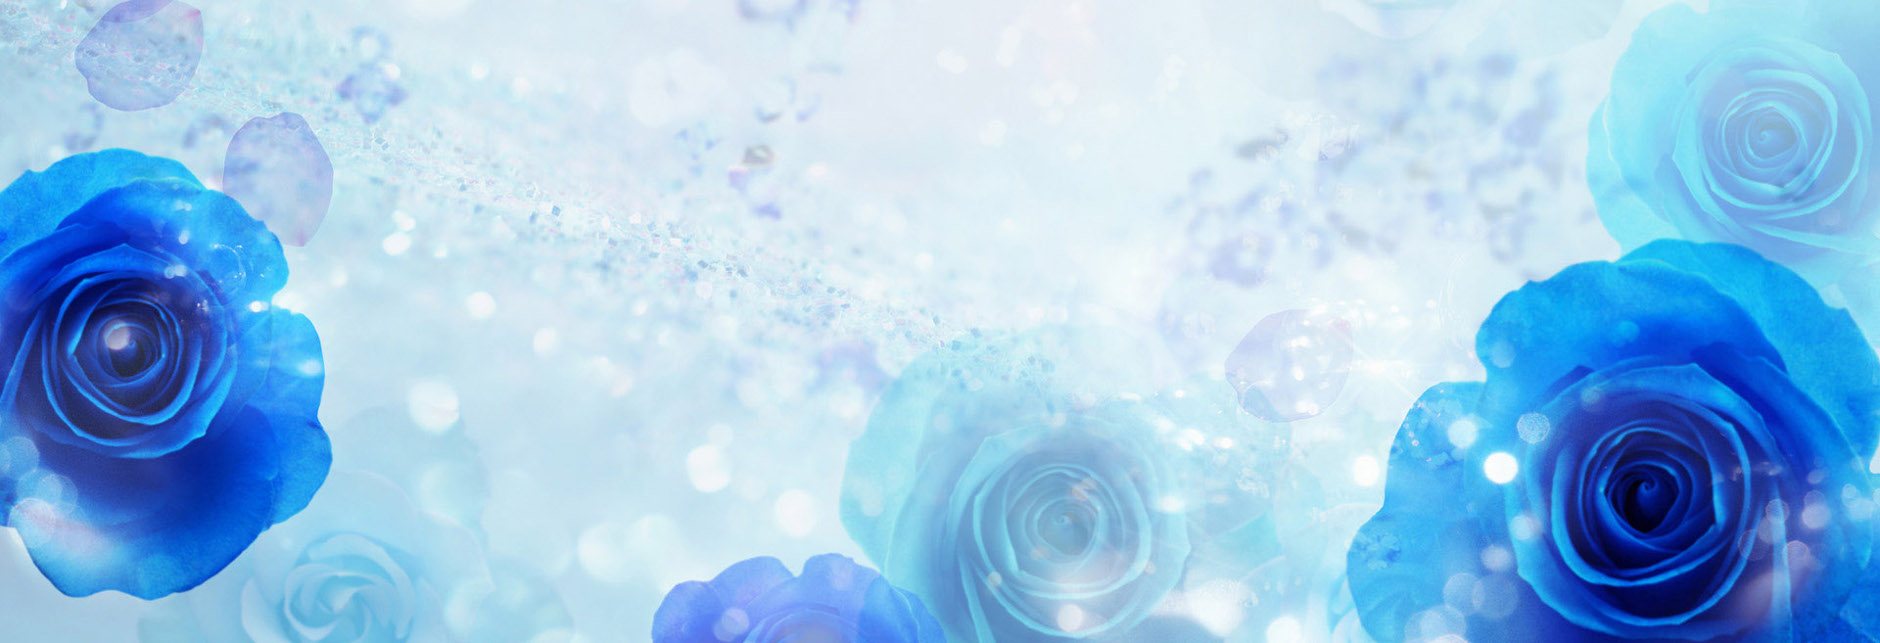 204279-blue-flower-background.jpg